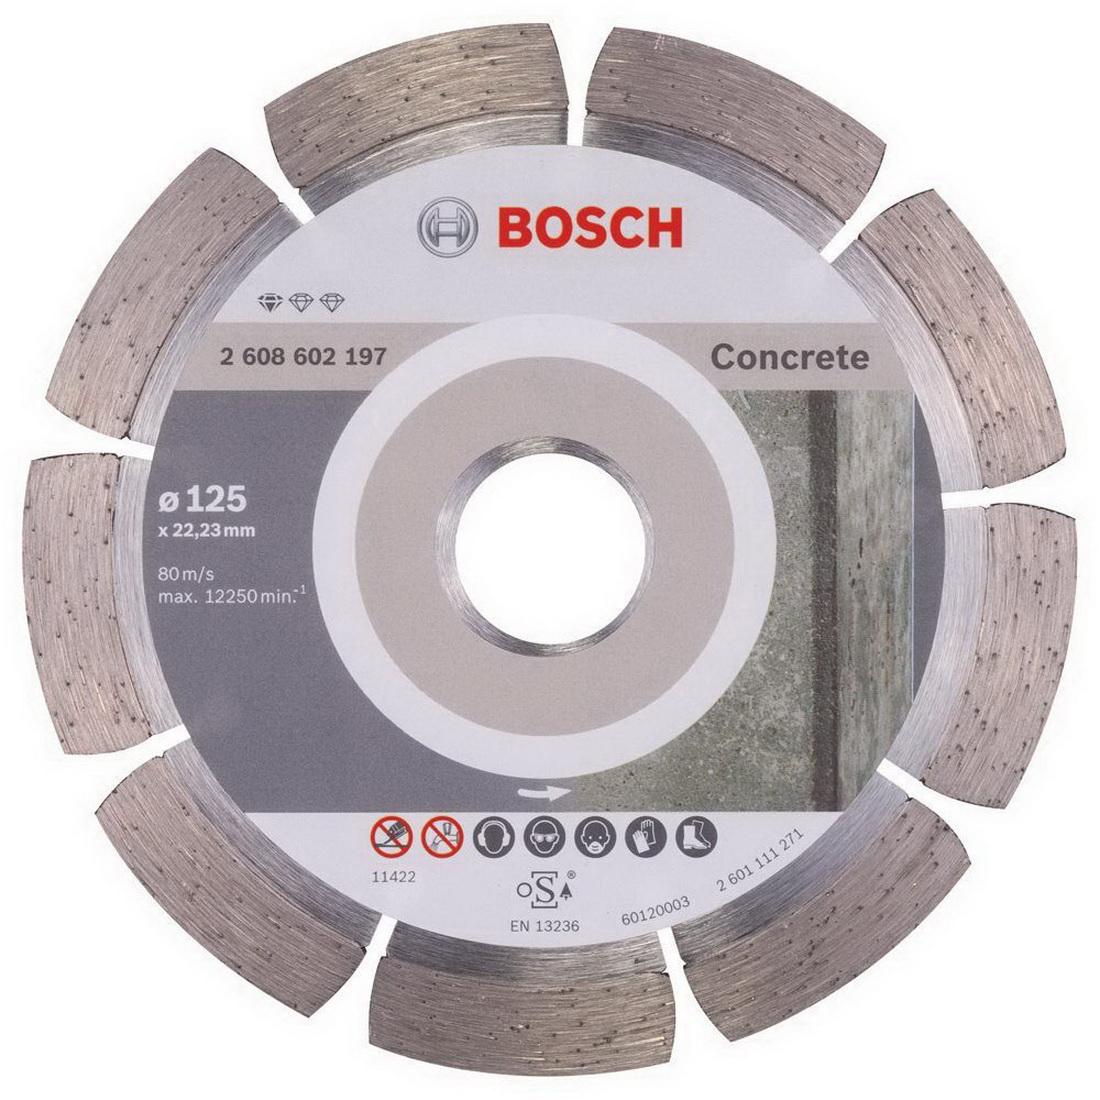 Diamond Cutting Disc 125 x 22.23 x 1.6 x 10mm 2608602197